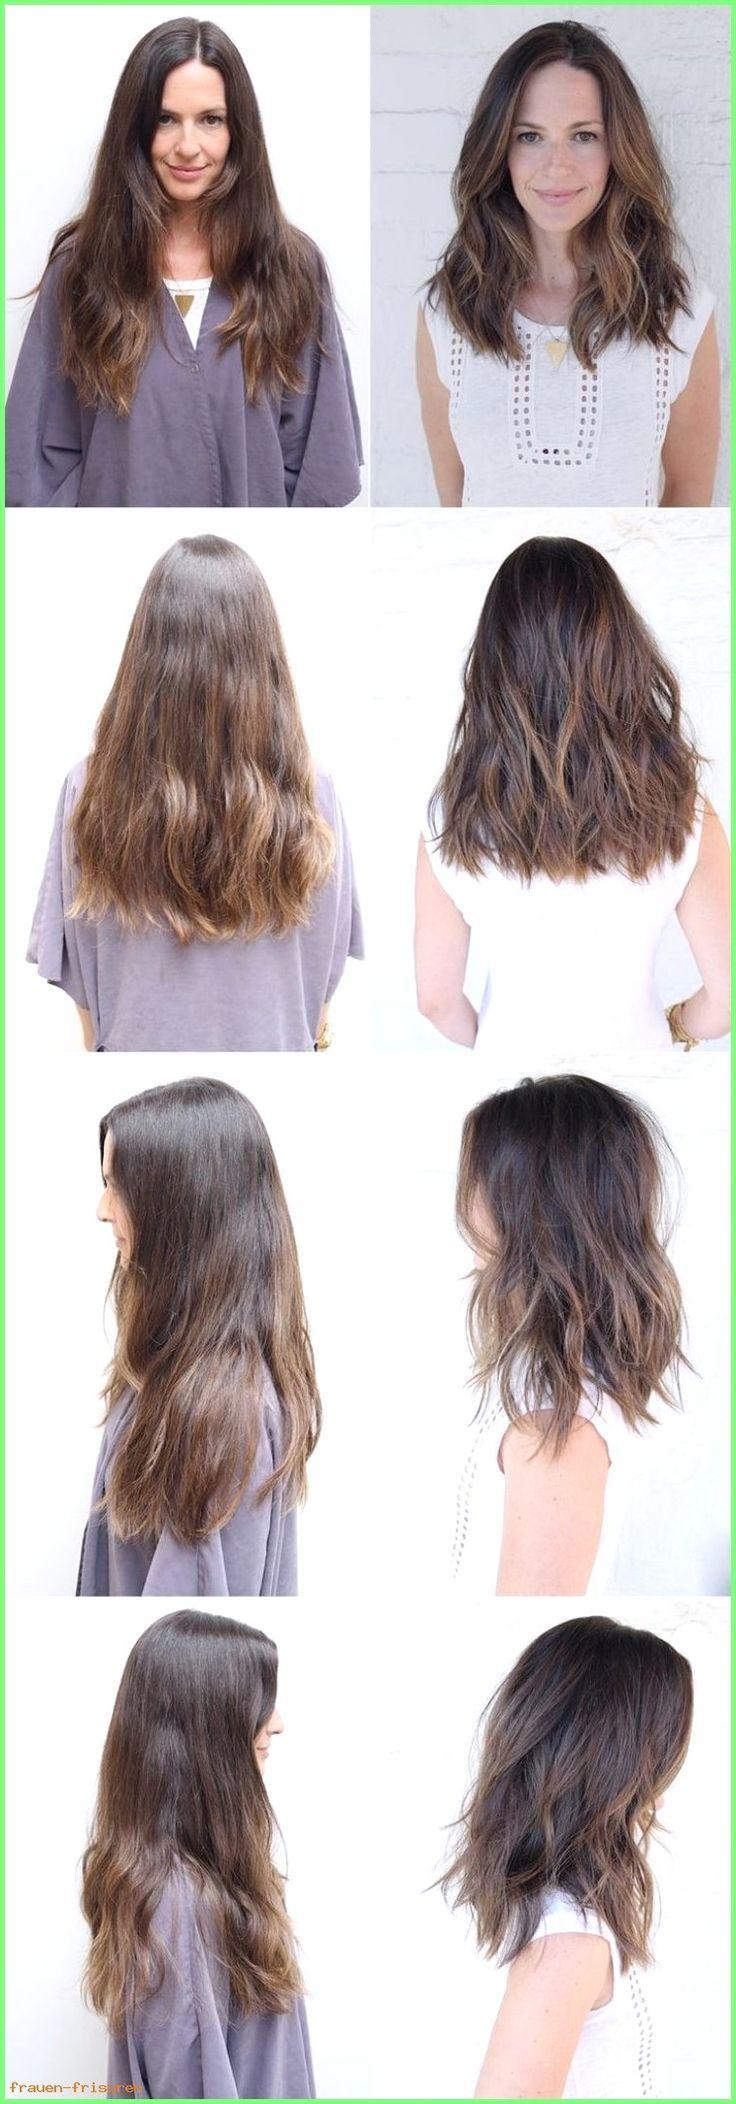 20+ Frisuren lange haare locken stufen Information